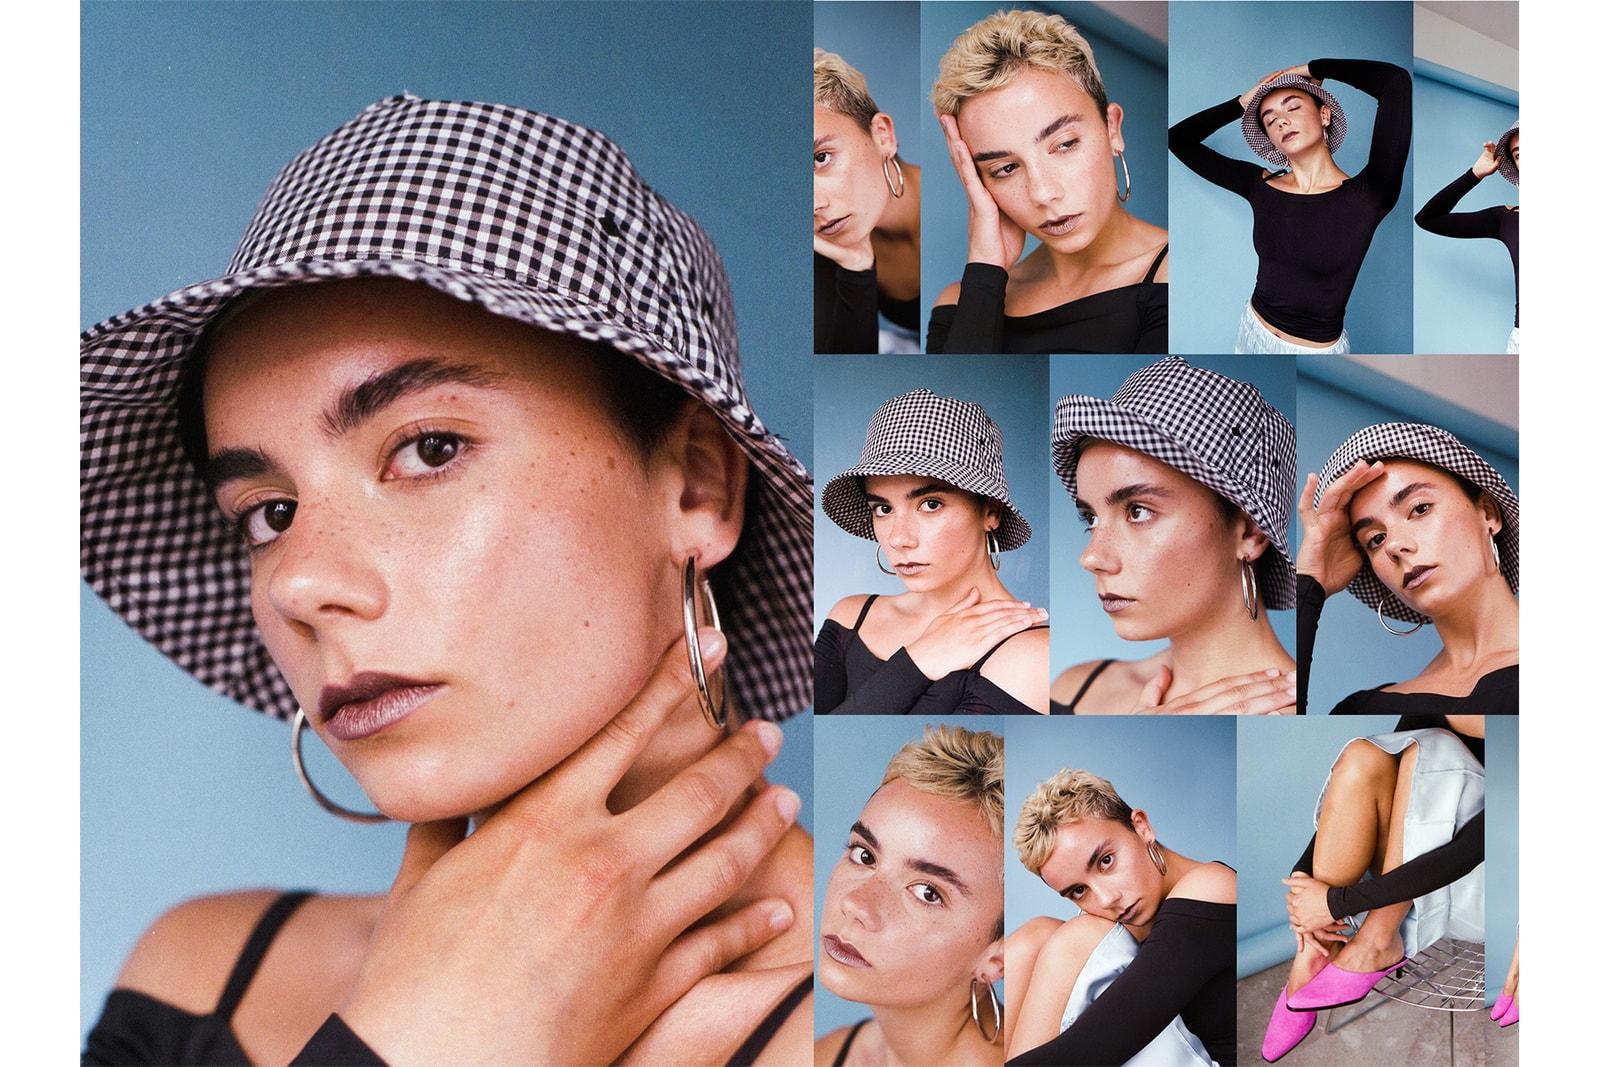 Too Faced Melted Matte-tallic Metallic Lipstick Editorial smoky eye blonde short hair model clear earrings